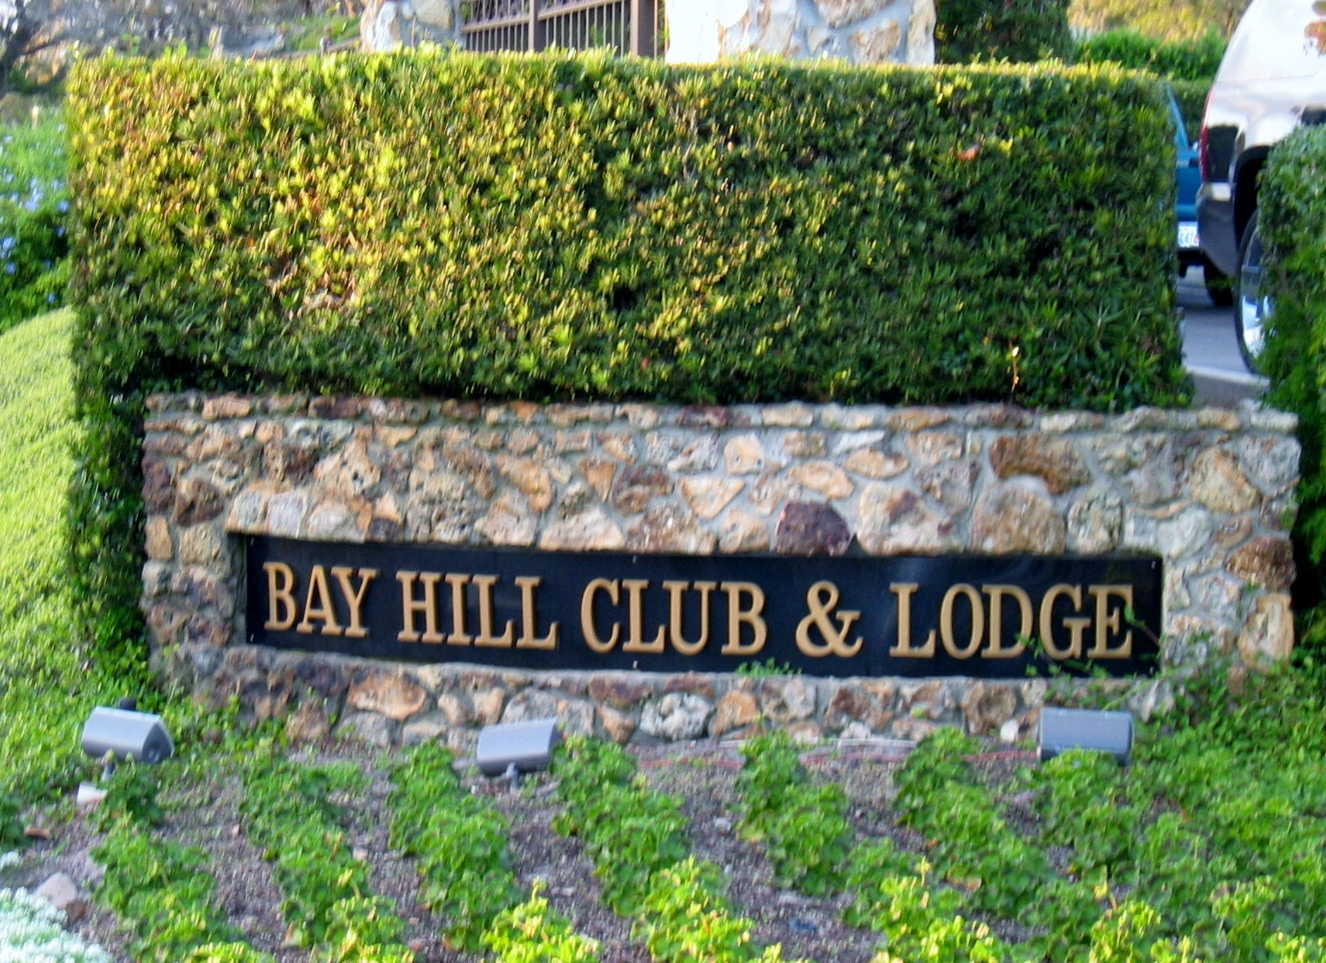 The Arnold Palmer Bay Hill Club & Lodge